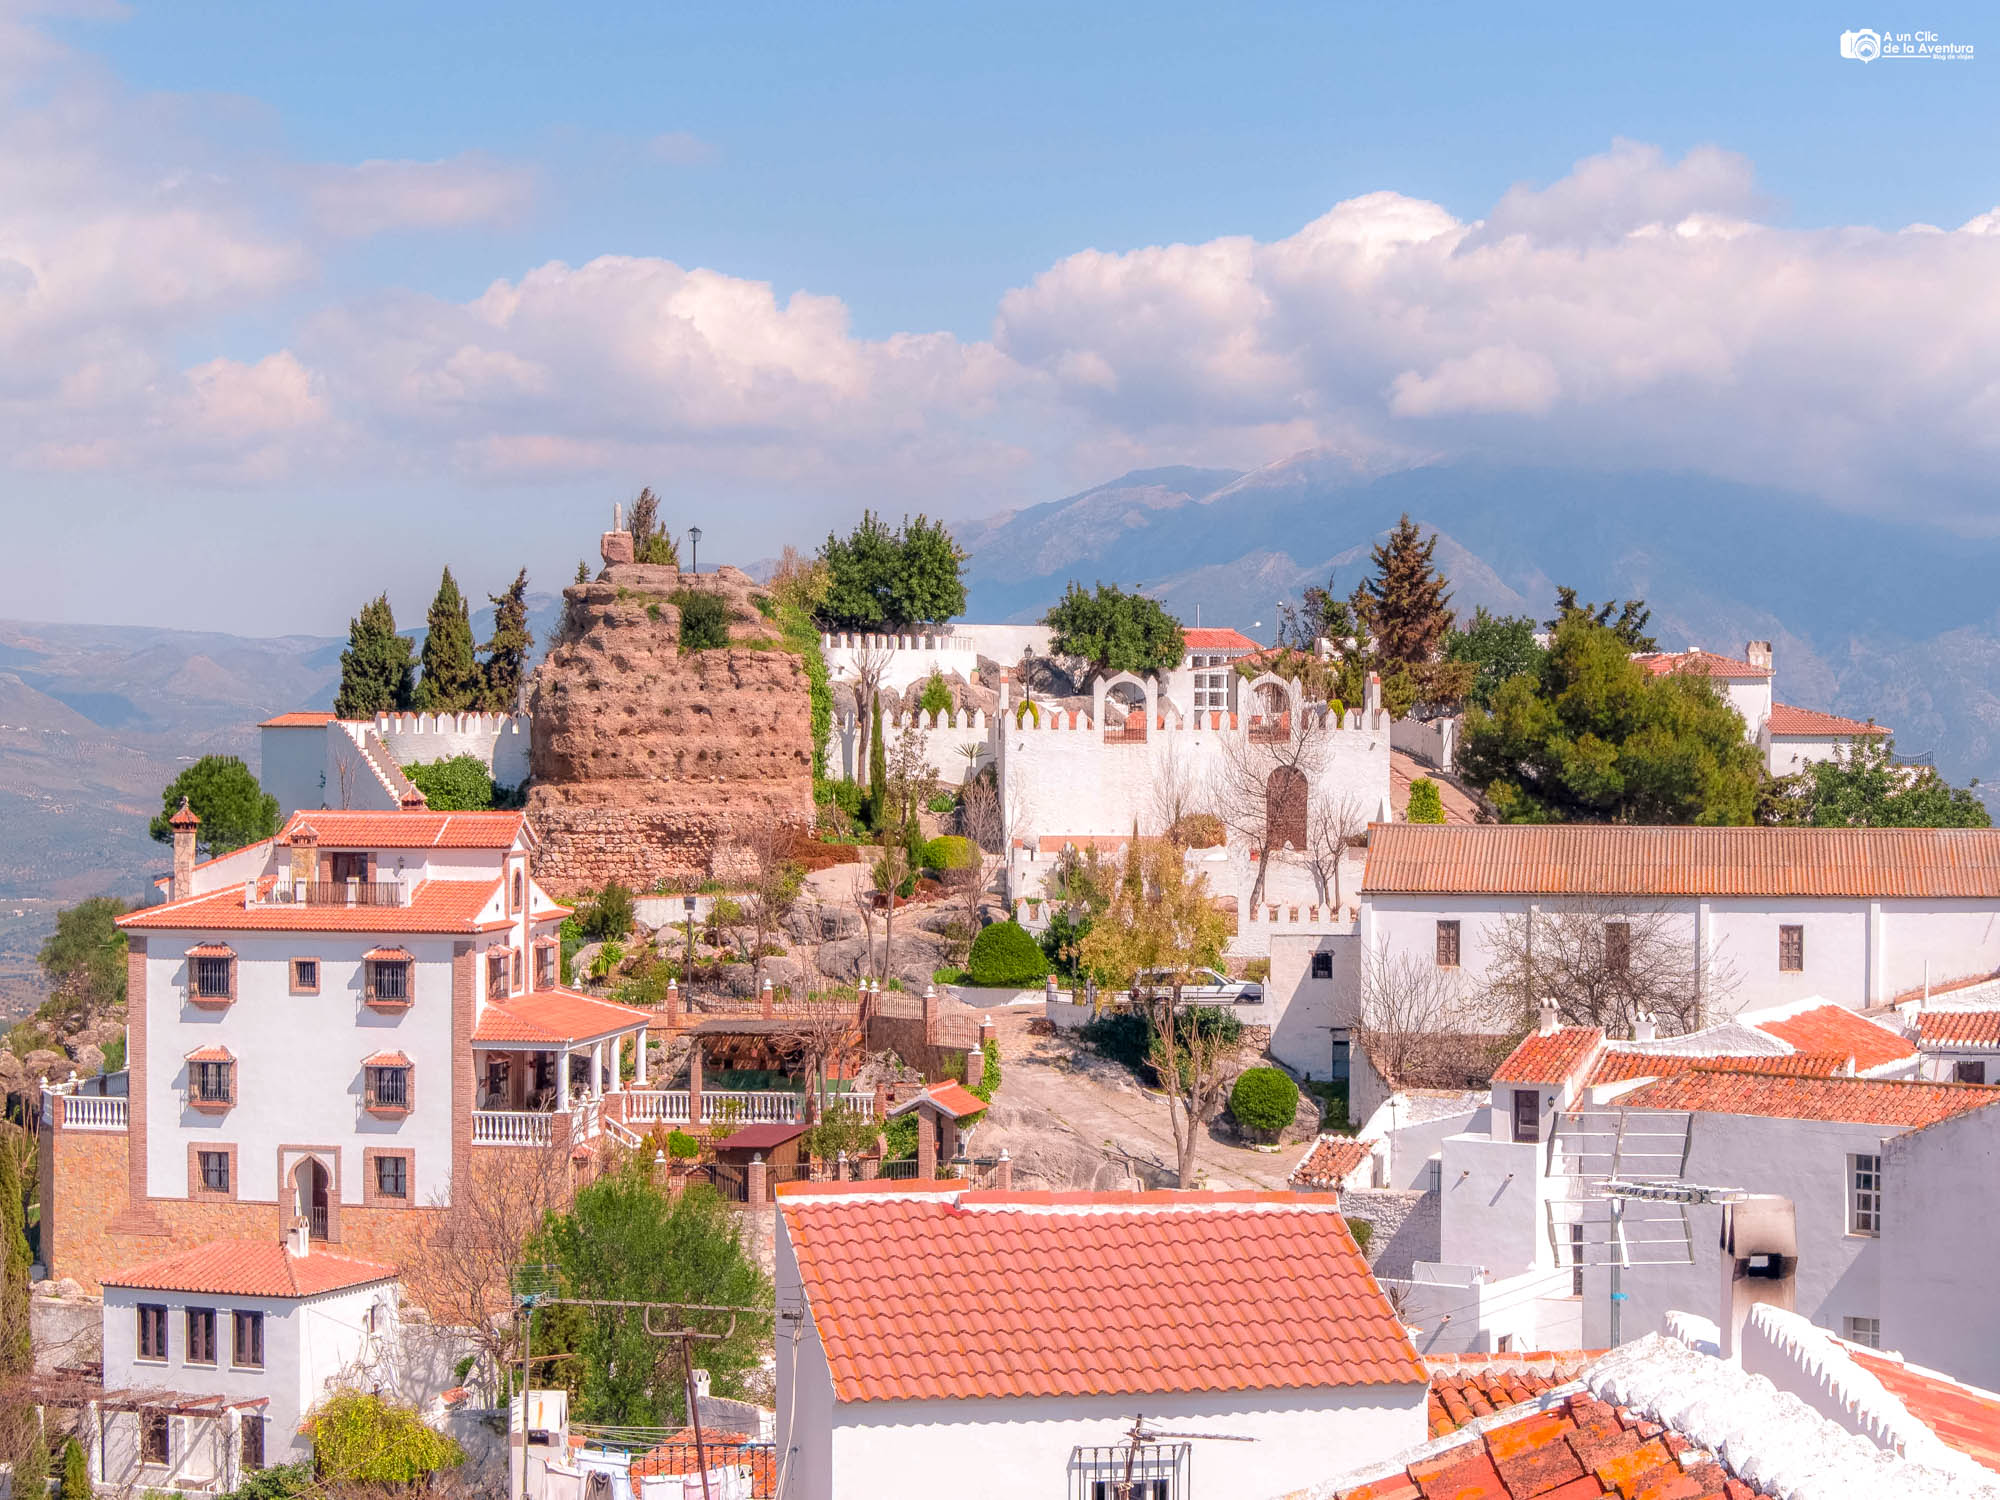 Panorámica de Comares, que ver cerca de Málaga